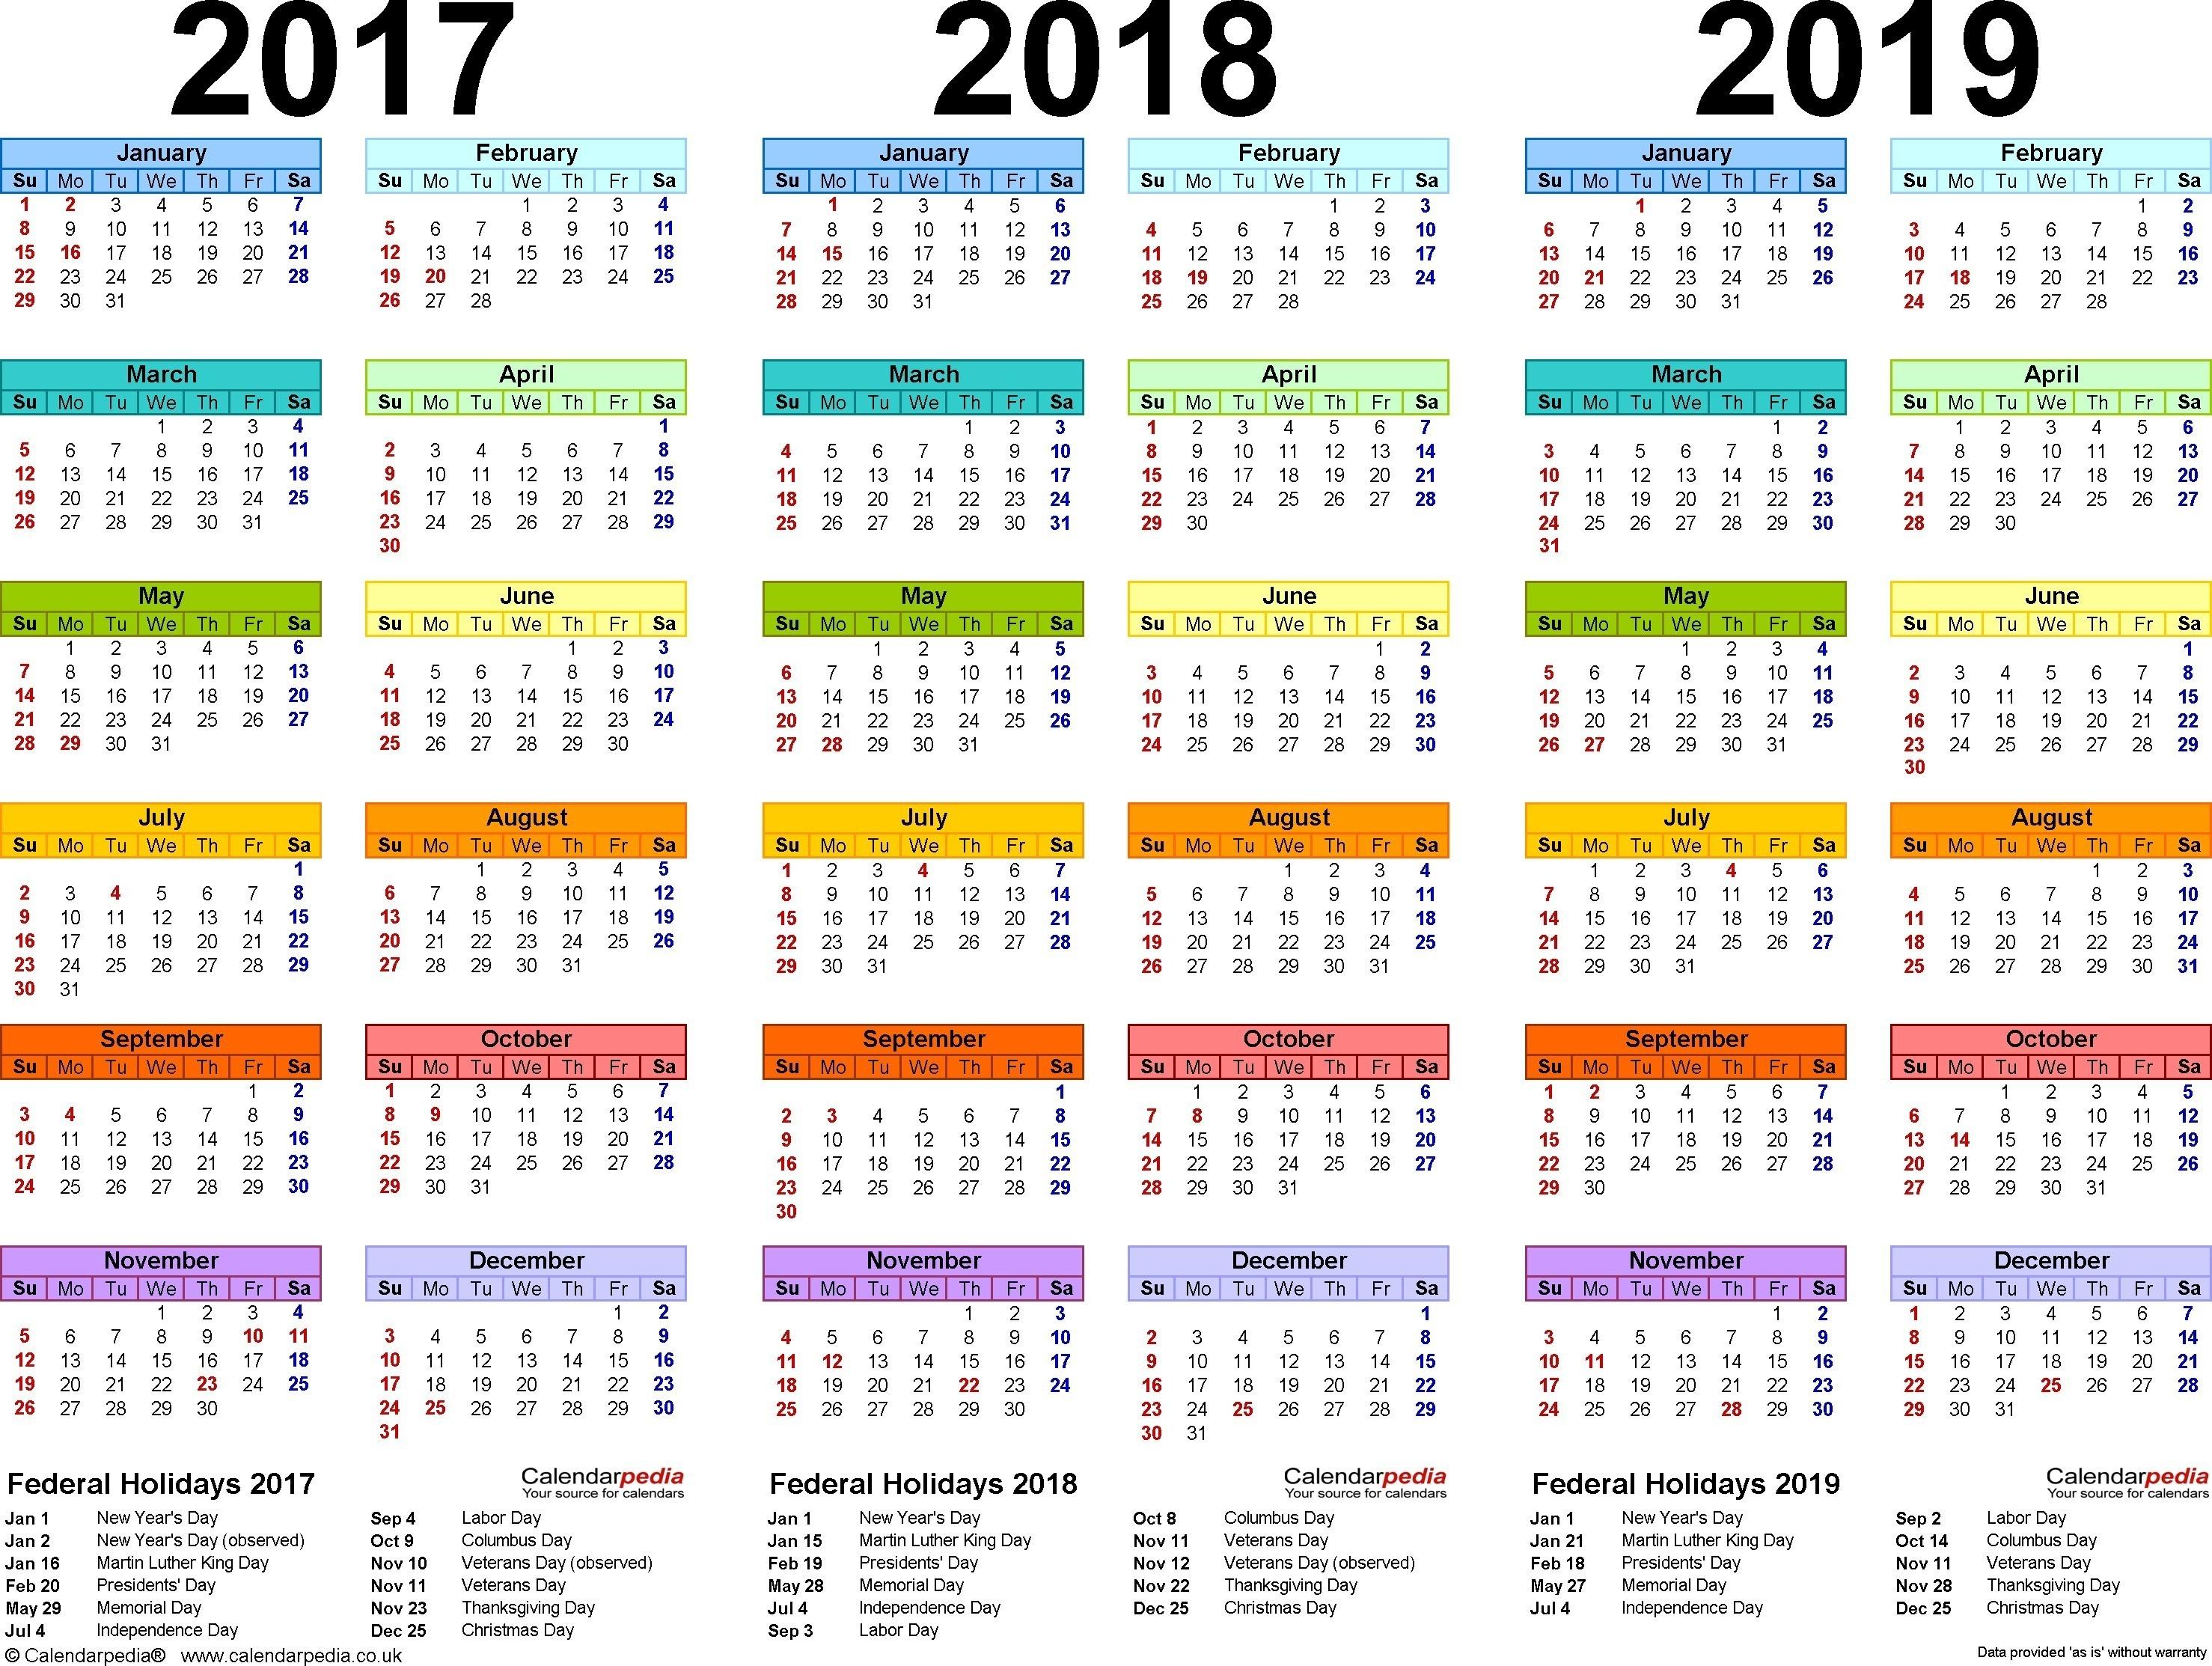 Depo-Provera Printable Calendar July 2019 | Calendar Template  Depo-Provera Calendar Printable Pdf